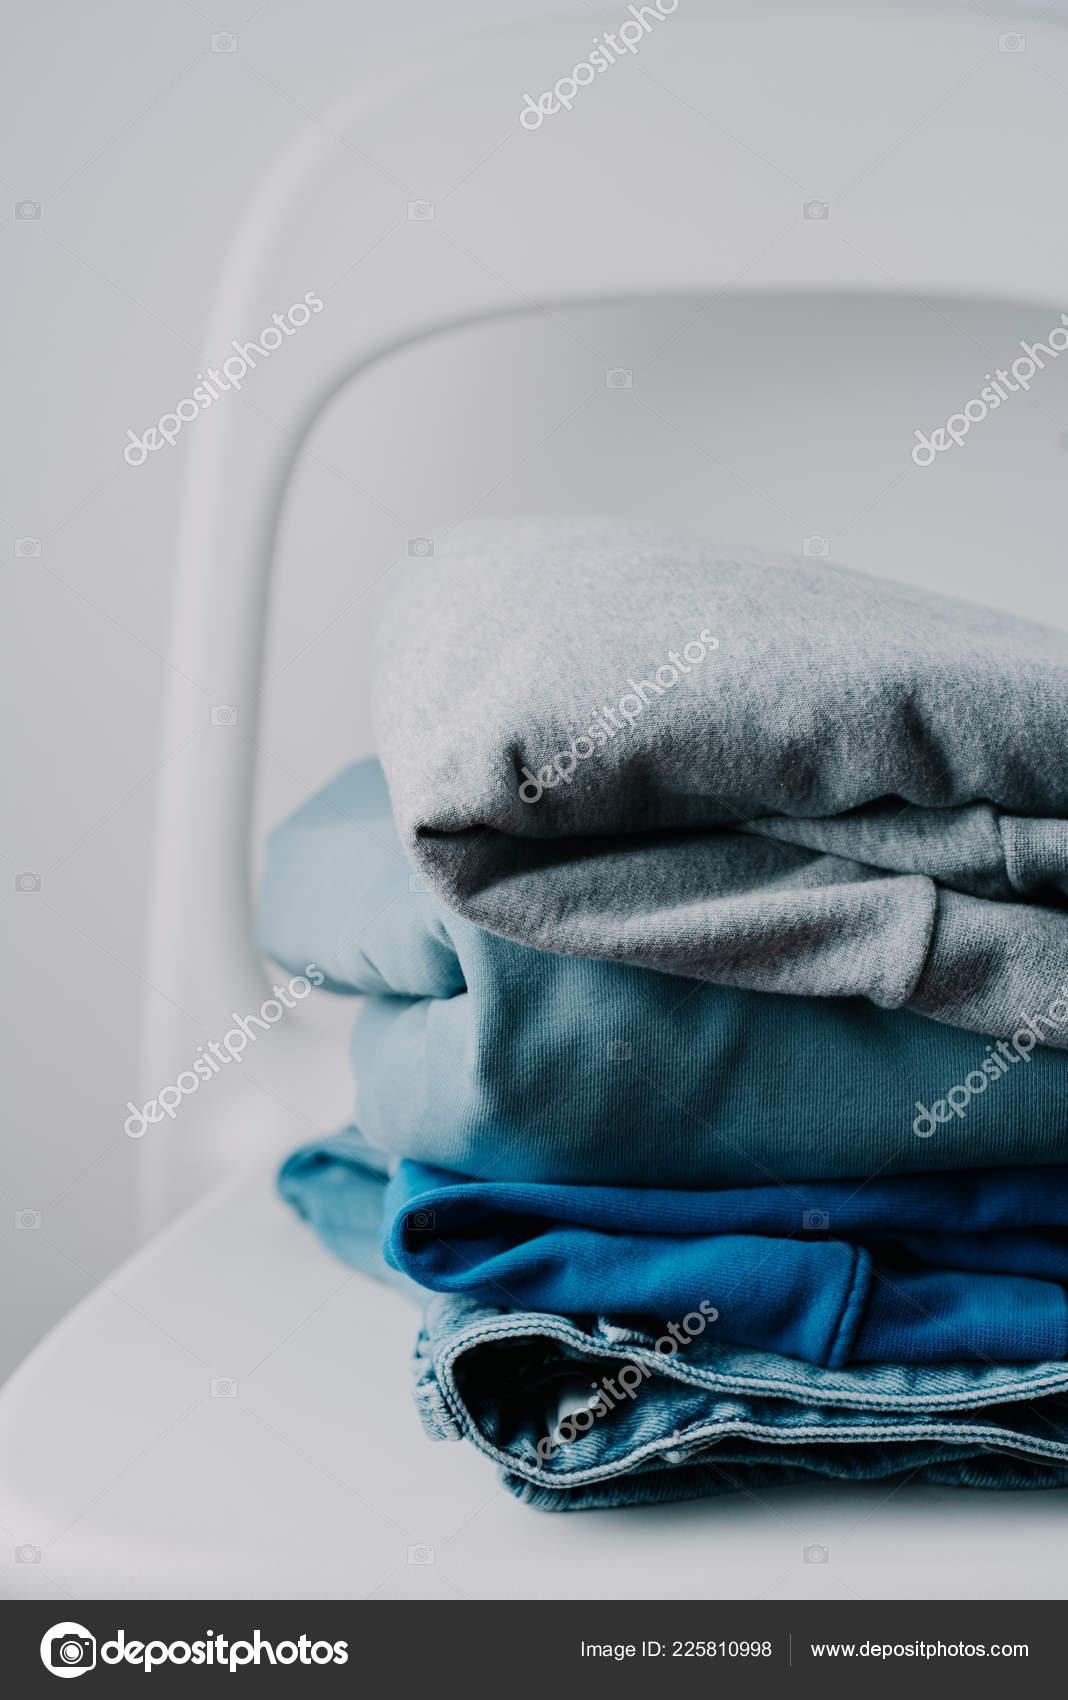 fcd012594c Paleta Colores Grises Azules Sobre Fondo Blanco Silla Minimalista Ropa —  Fotos de Stock